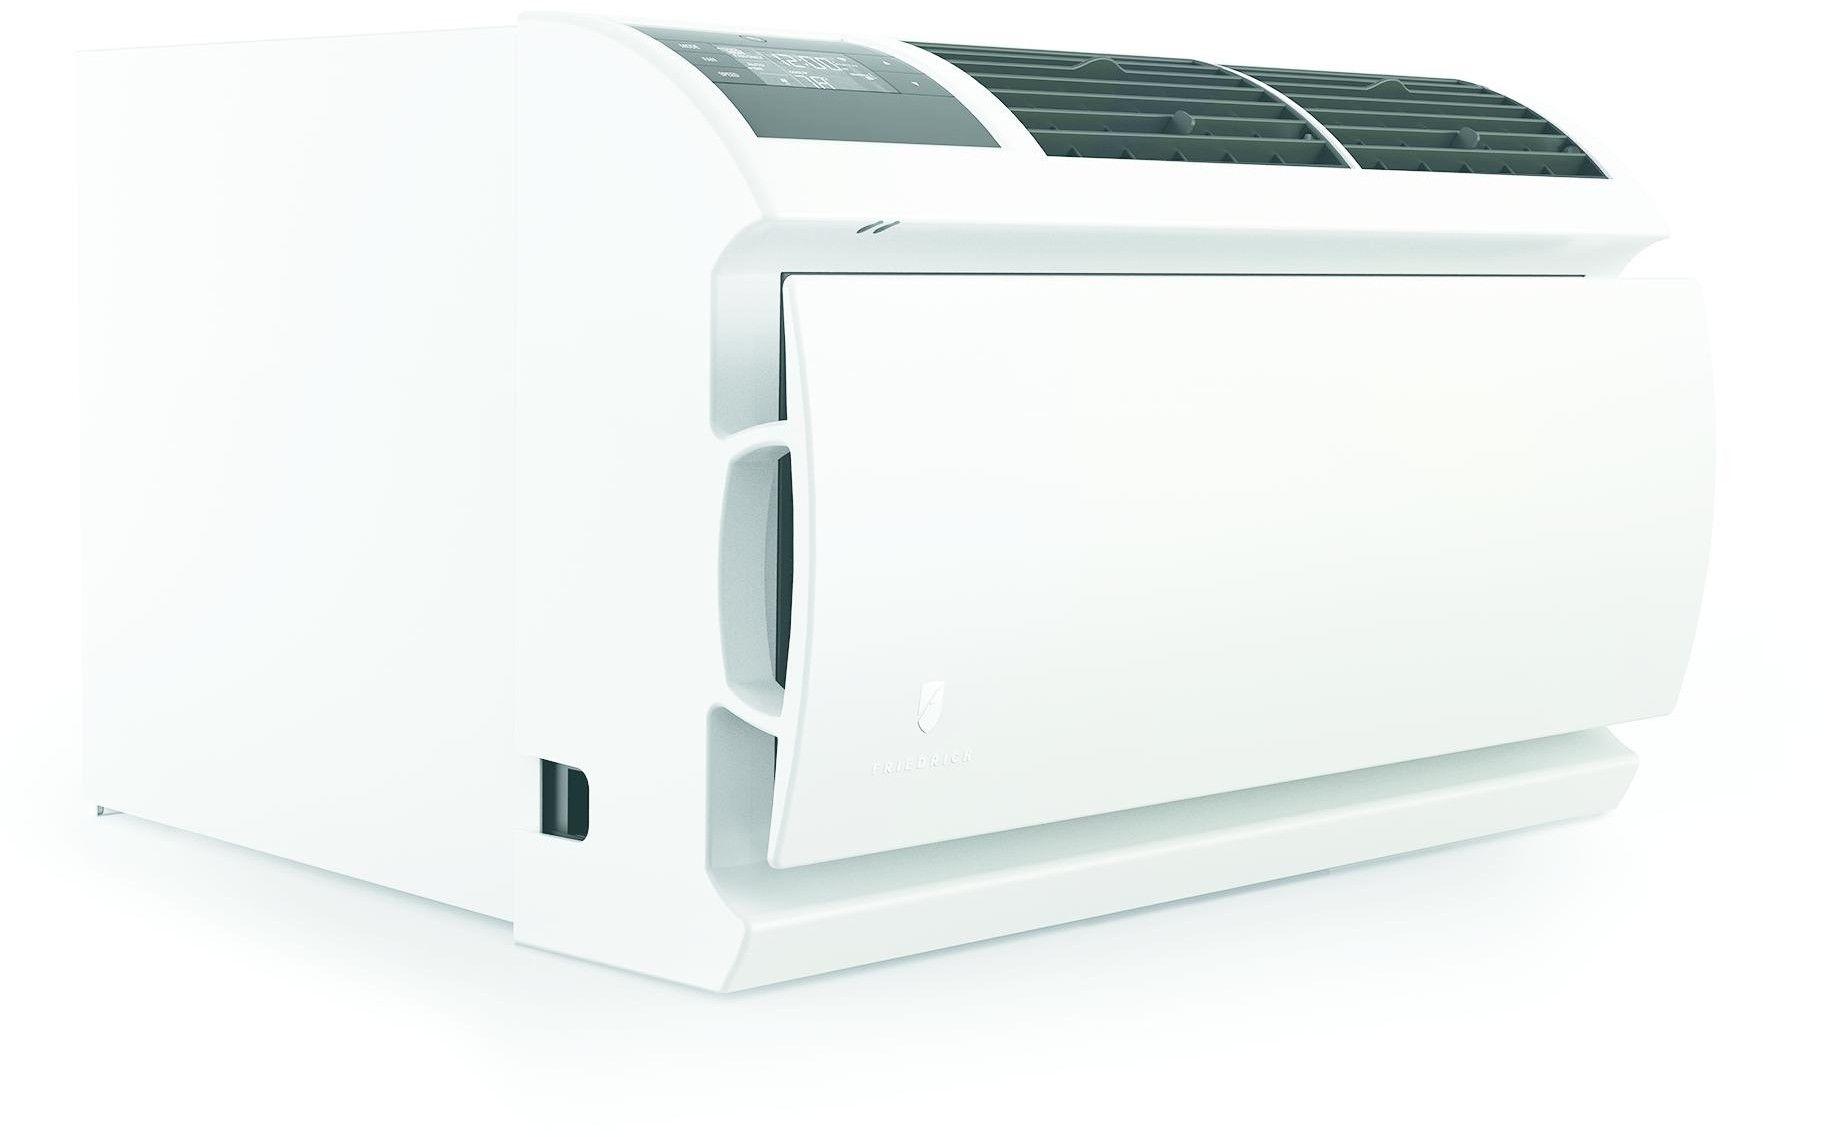 Friedrich Wallmaster Series Wct12a30a Rotary Compressor Heat Pump Rubber Grommets